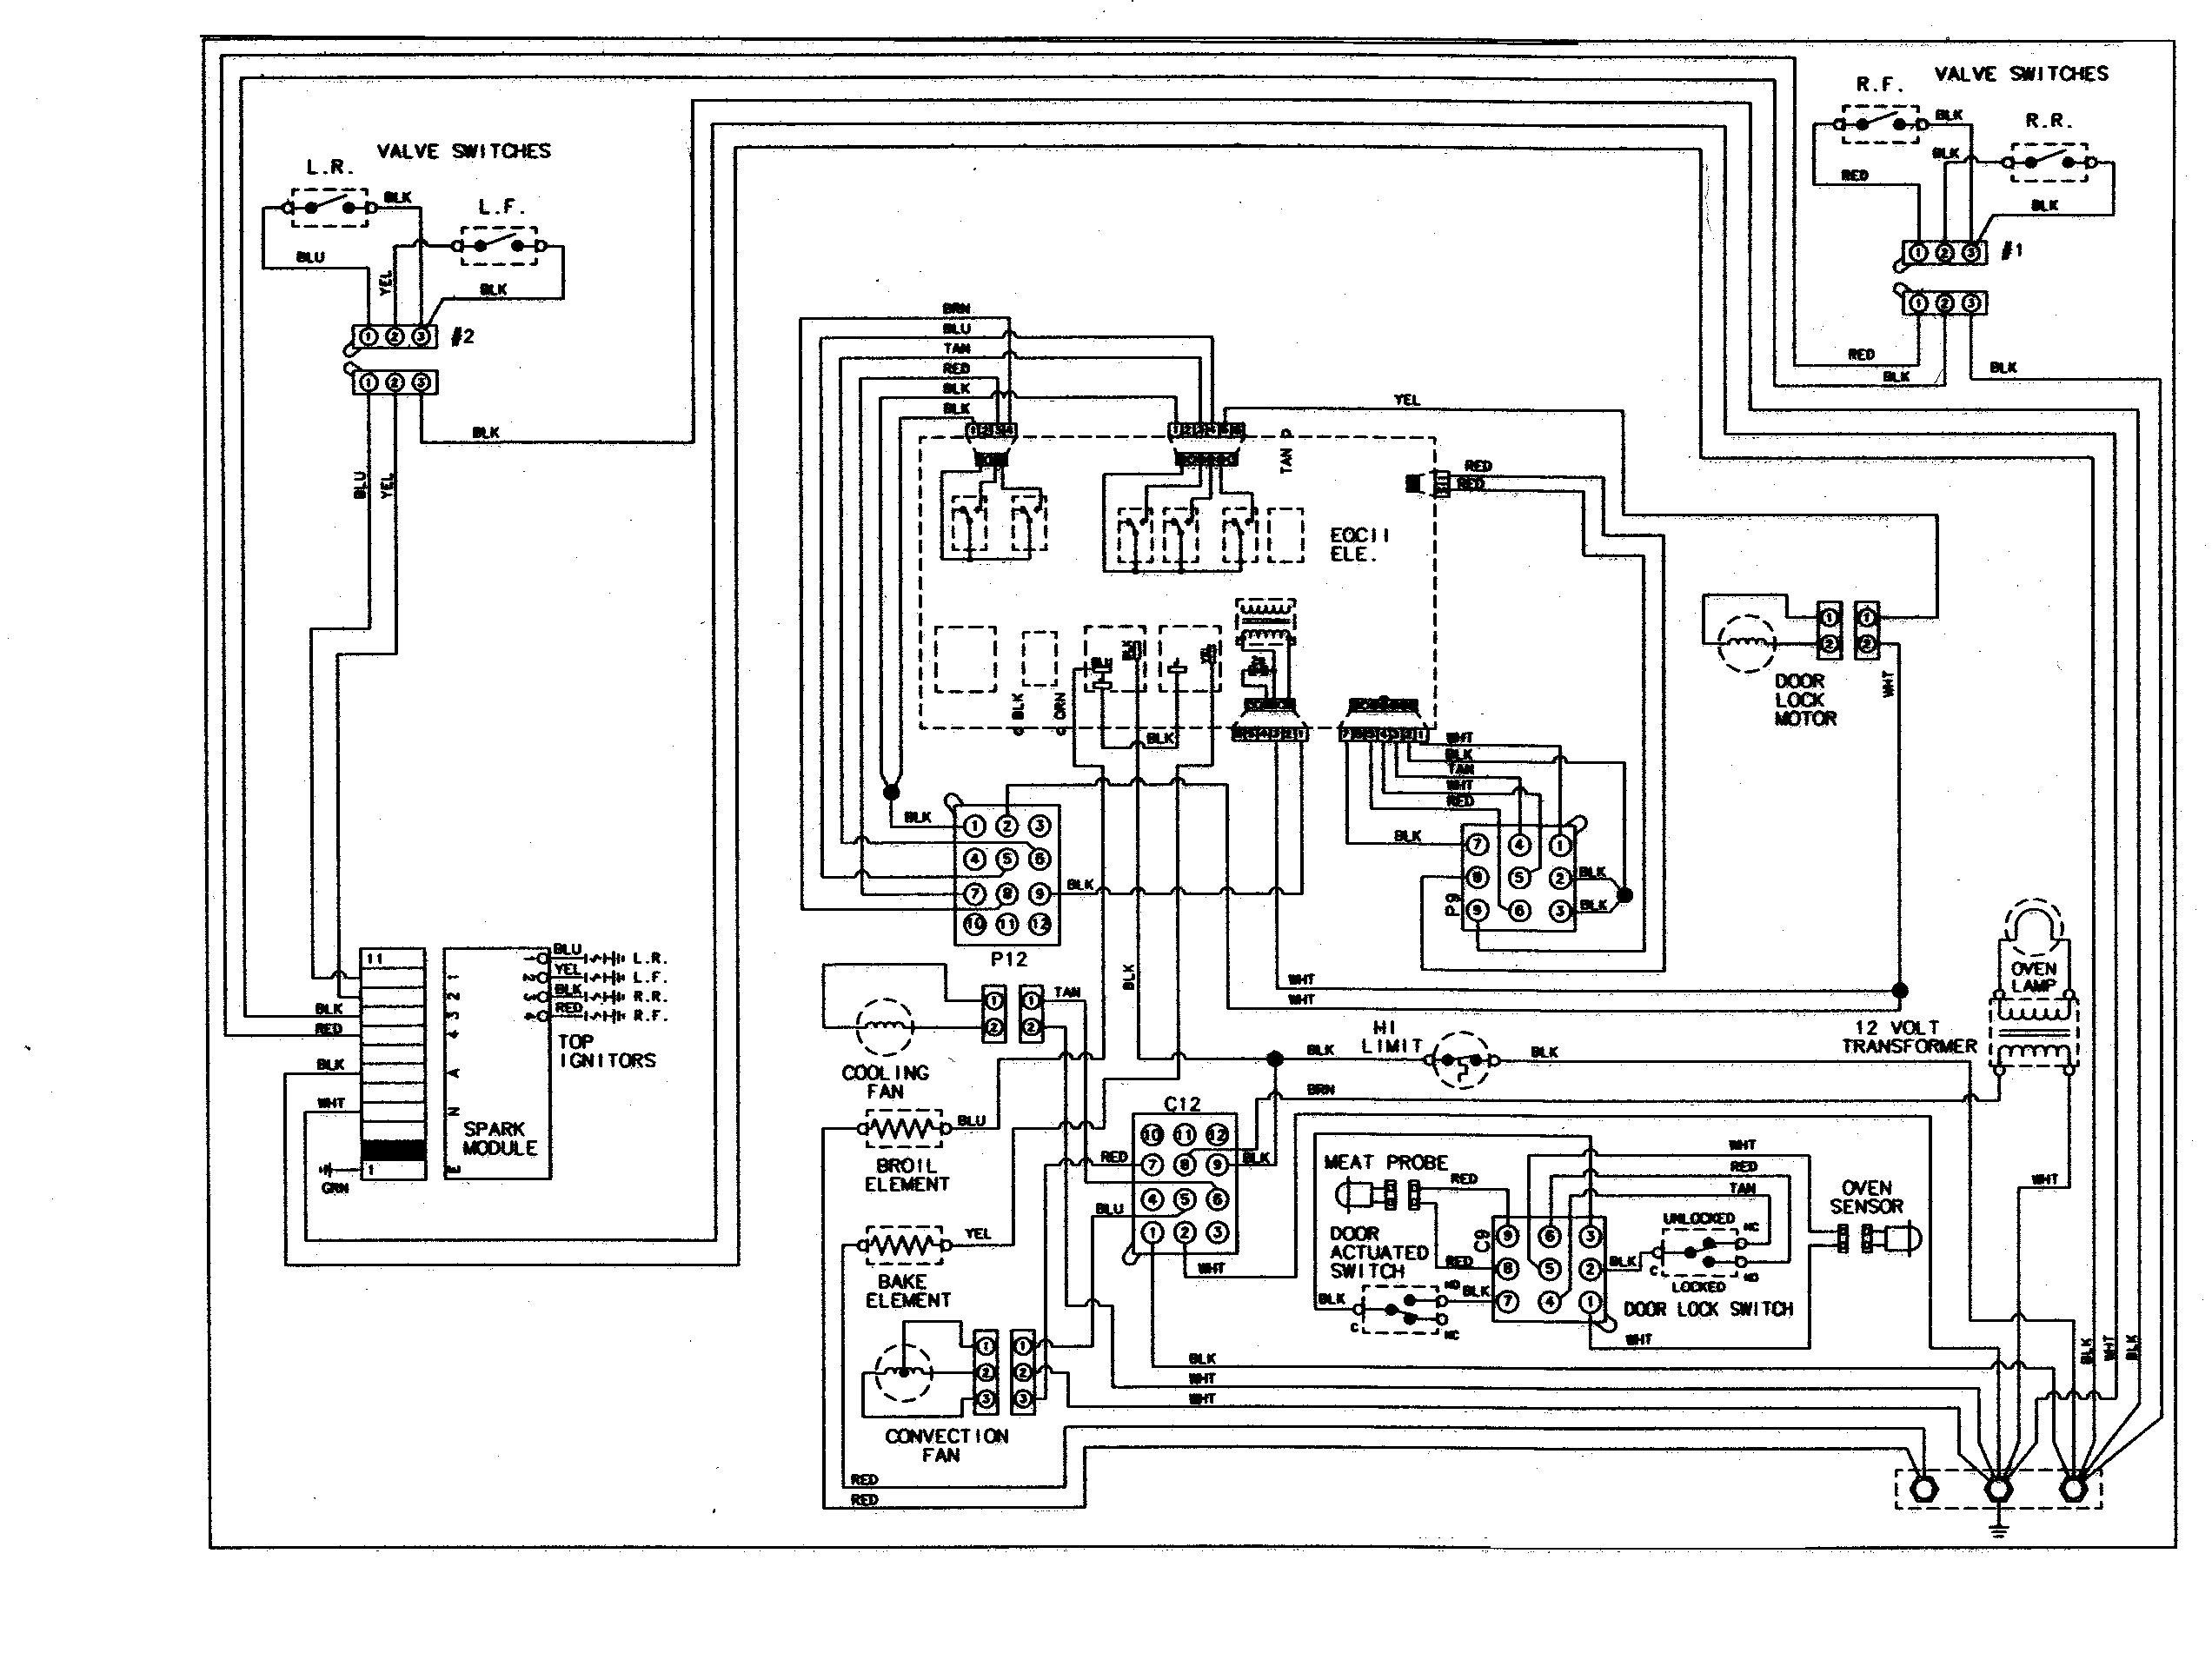 Whirlpool Grill Wiring Diagram - Dodge Sprinter Wiring Diagrams -  fusebox.1997wir.jeanjaures37.fr | Ge Gas Stove Wiring Diagram |  | Wiring Diagram Resource